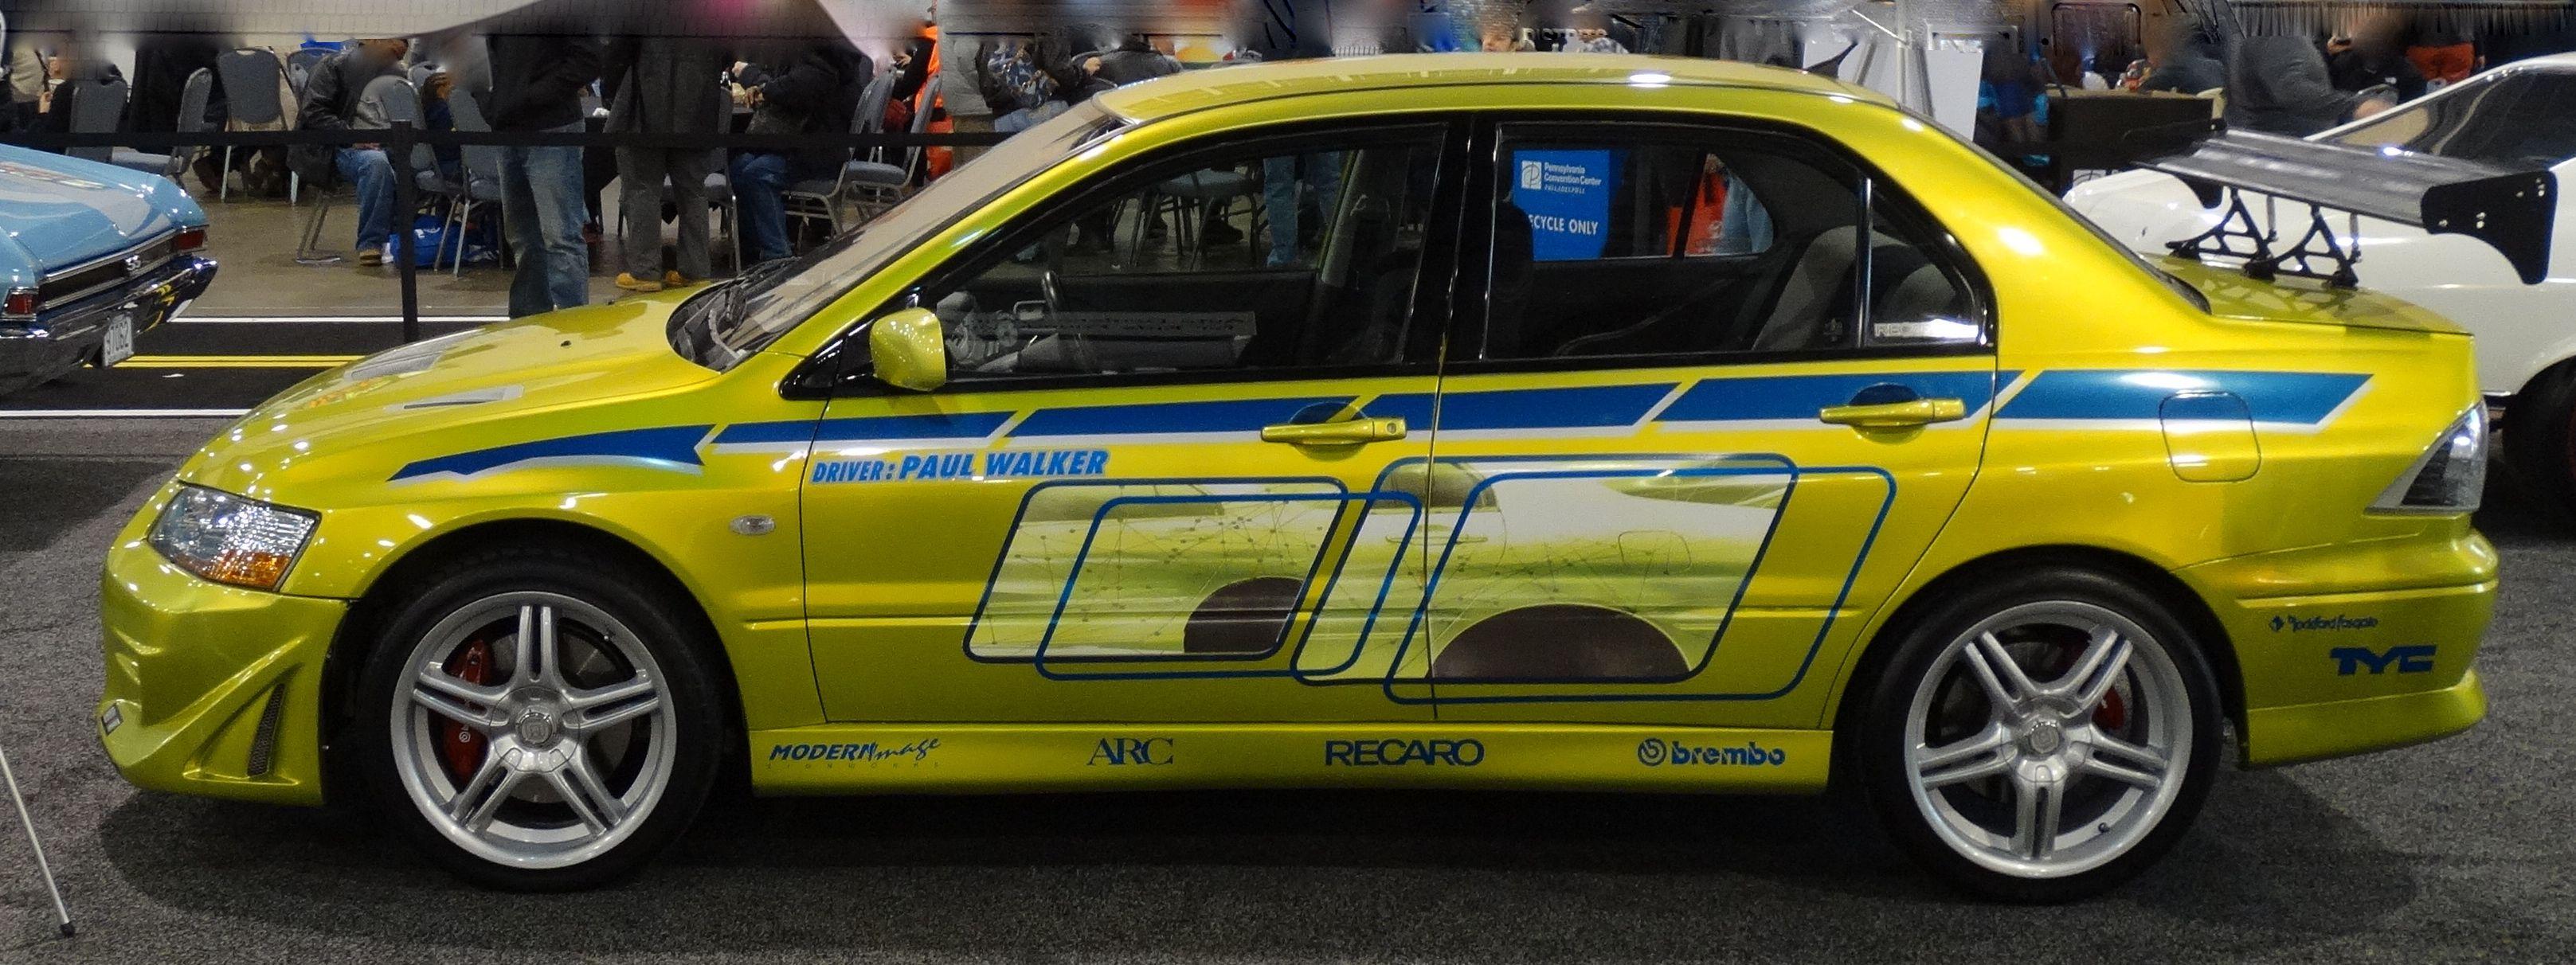 paul walker 39 s 2 fast 2 furious car cars pinterest cars. Black Bedroom Furniture Sets. Home Design Ideas